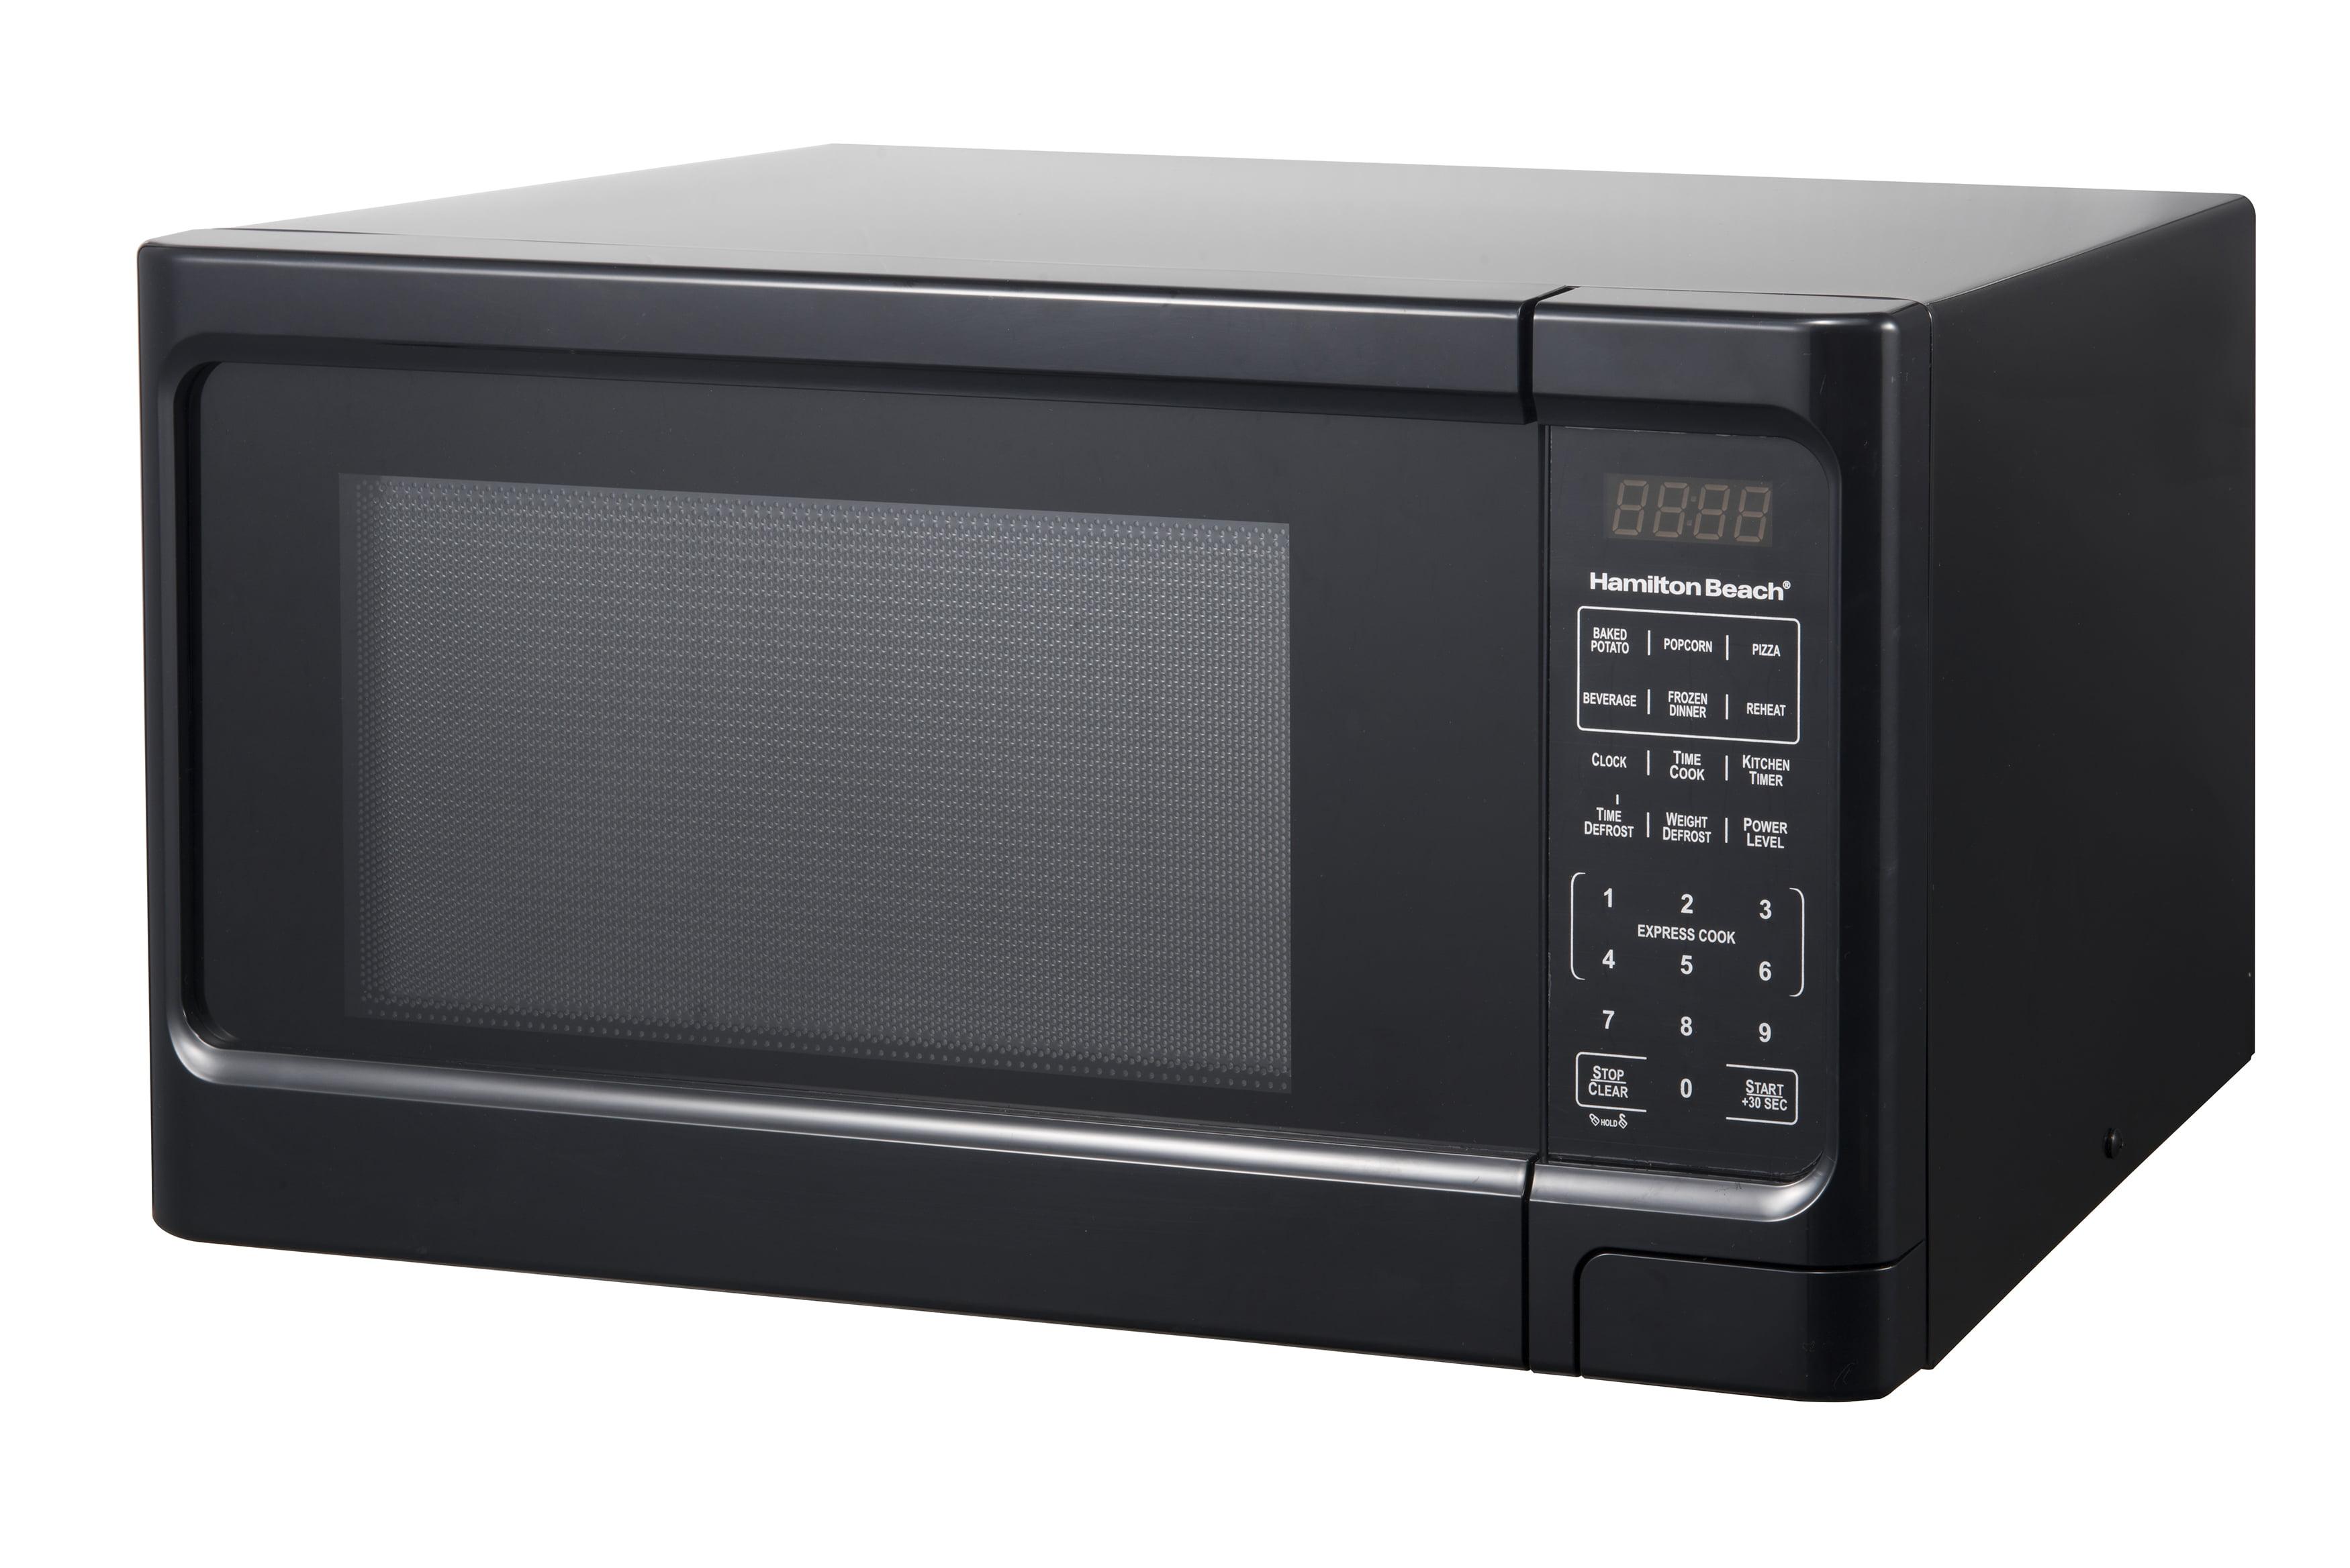 Hamilton Beach 1.1 Cu. Ft. Black Digital Microwave Oven - Walmart.com -  Walmart.com